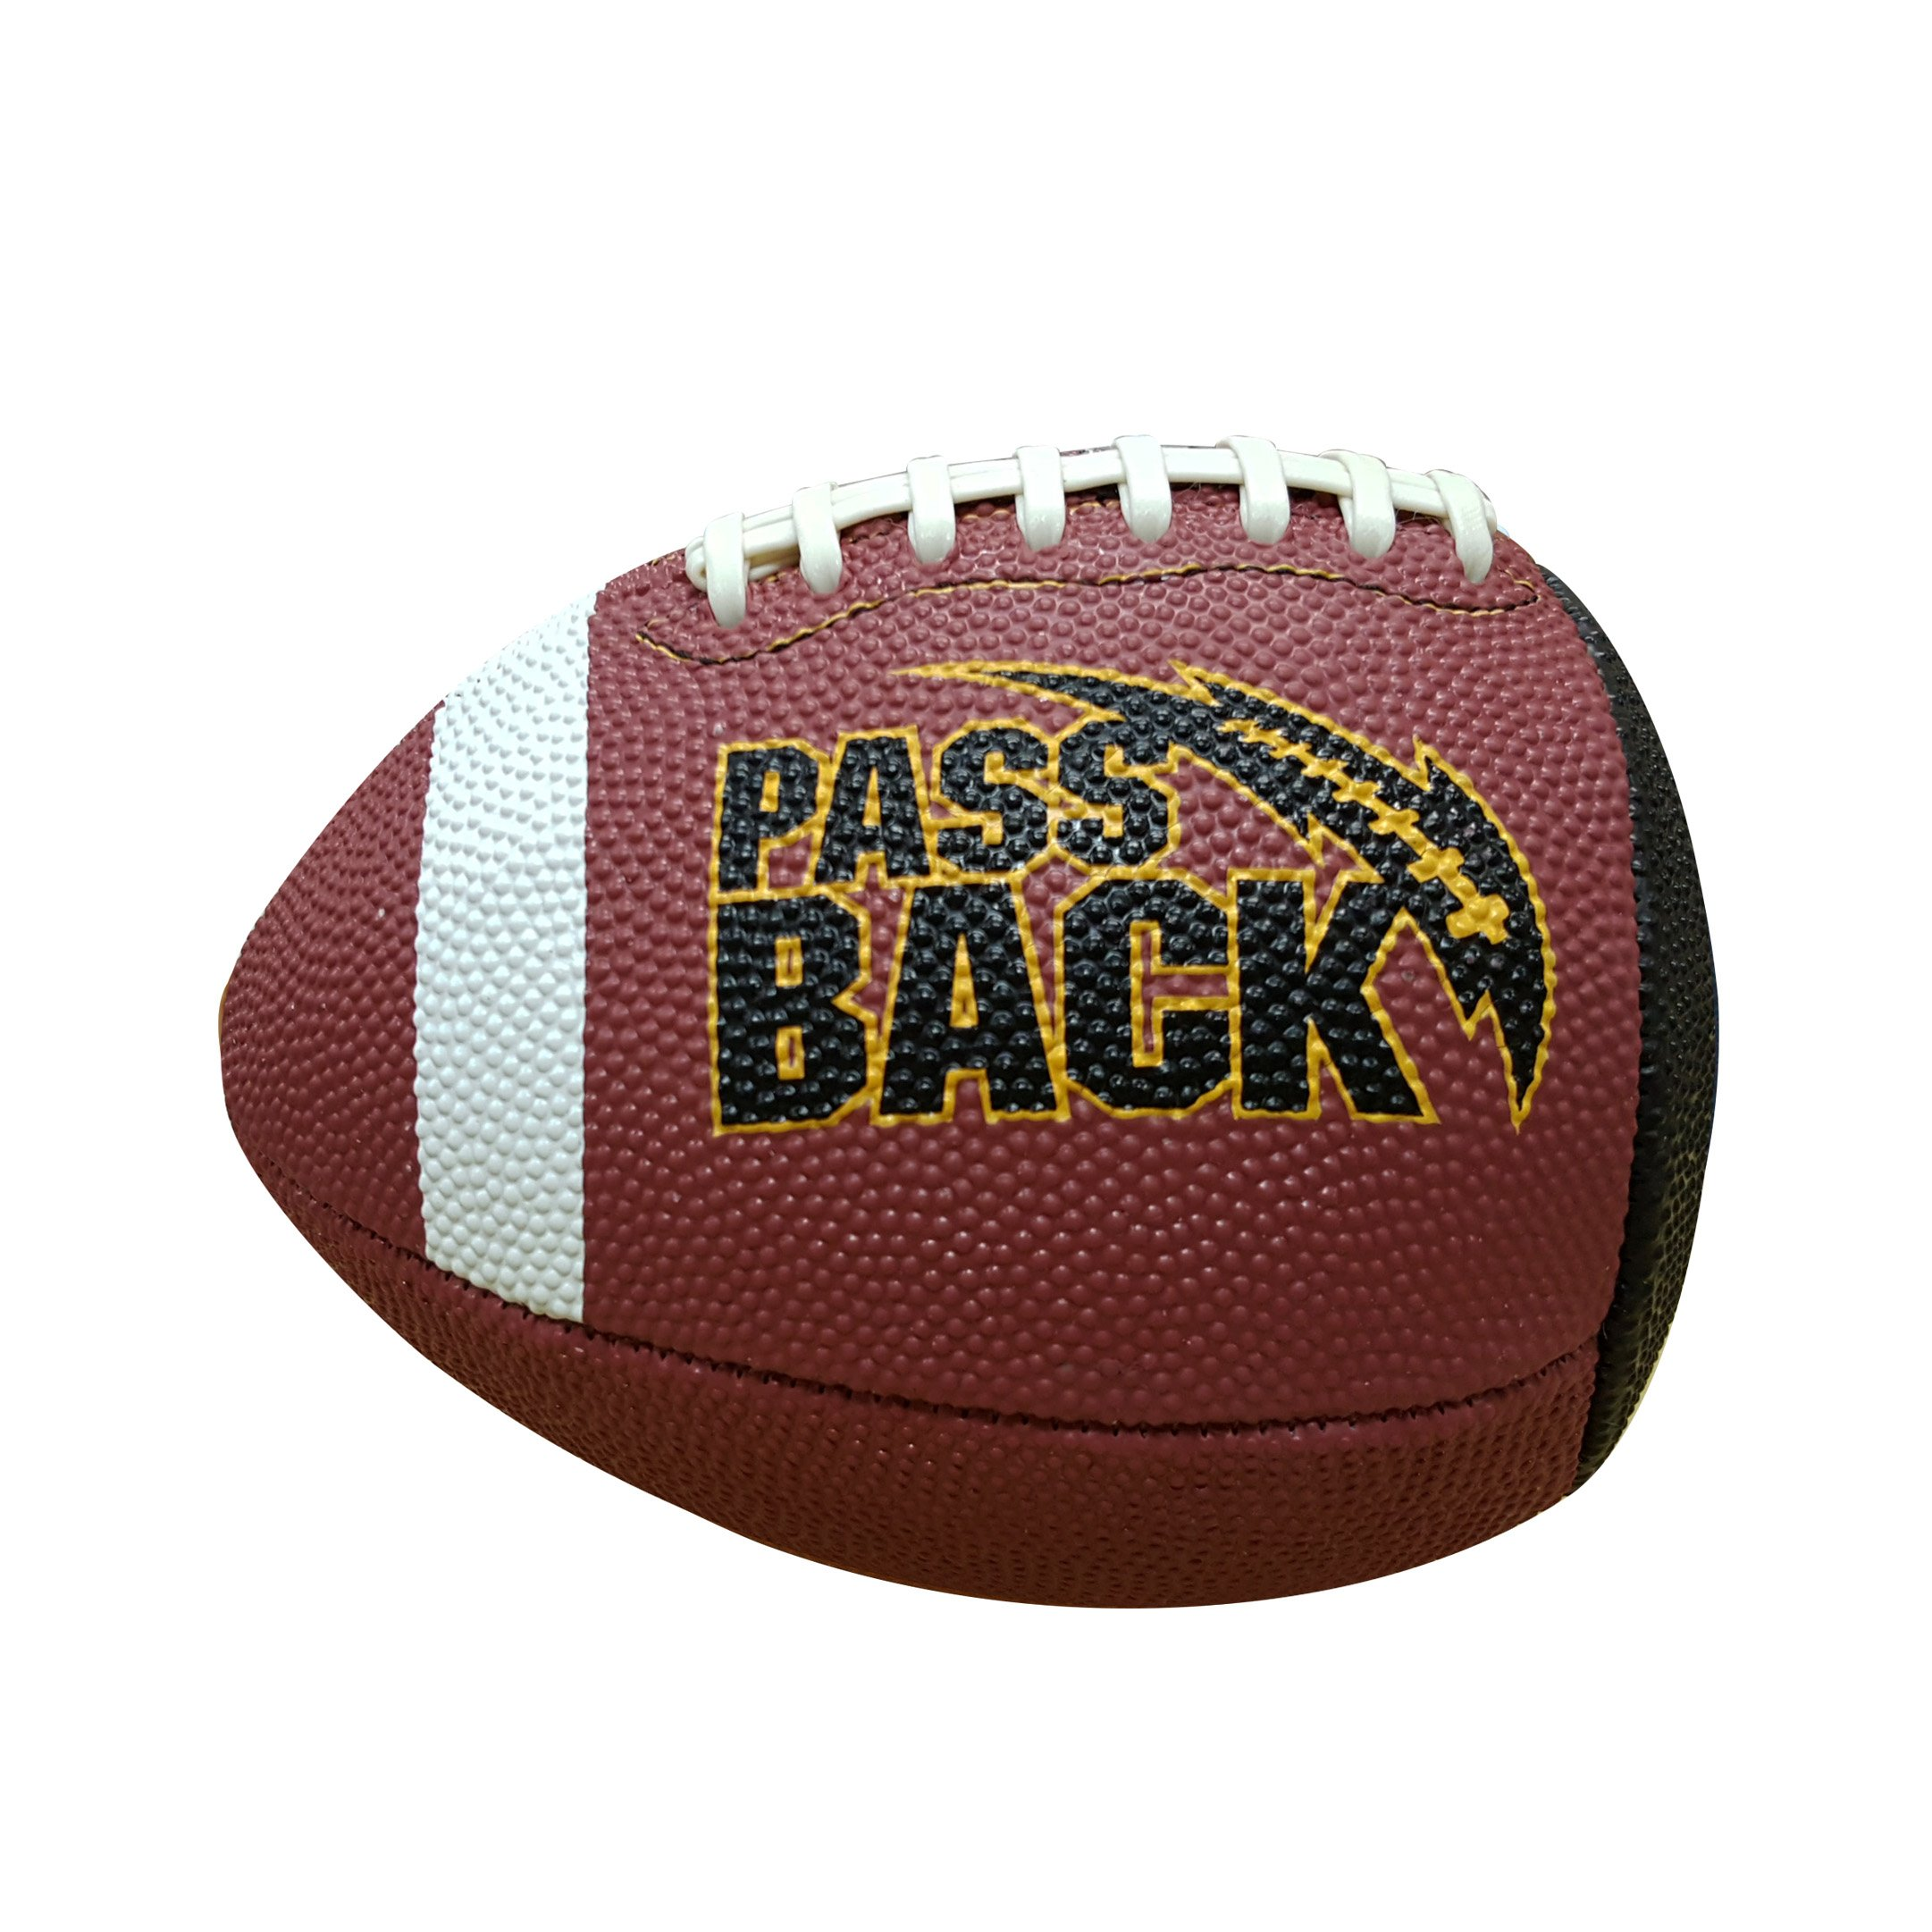 Passback Football - Junior Size - Rubber